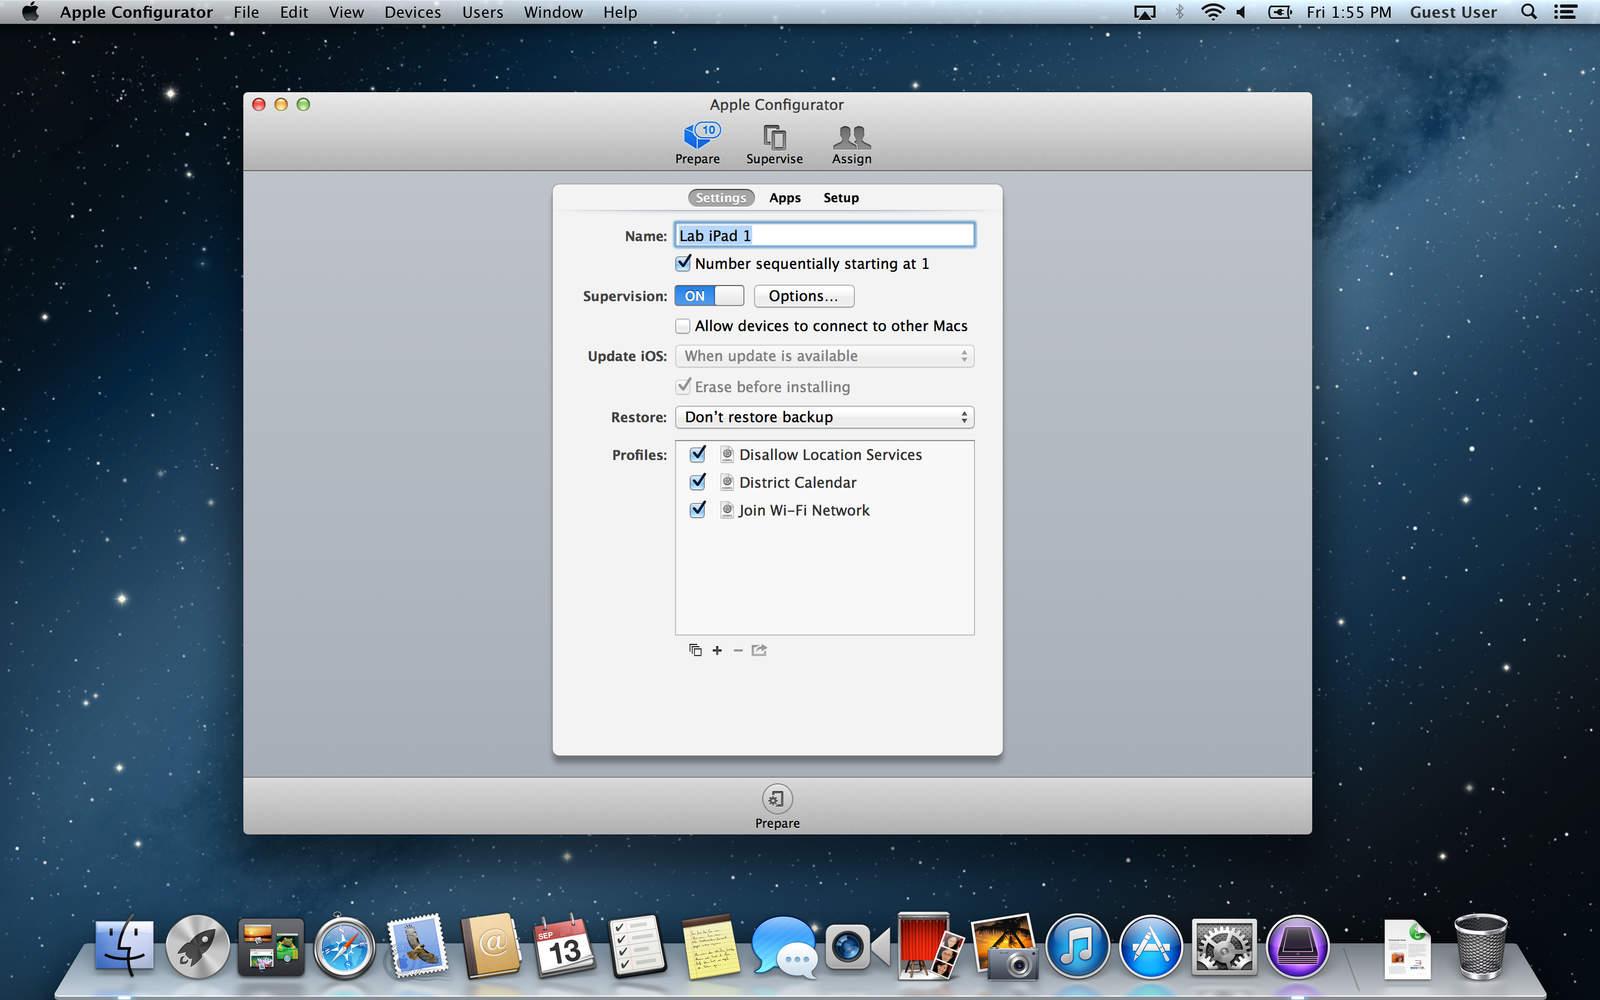 Apple Configurator - OS X